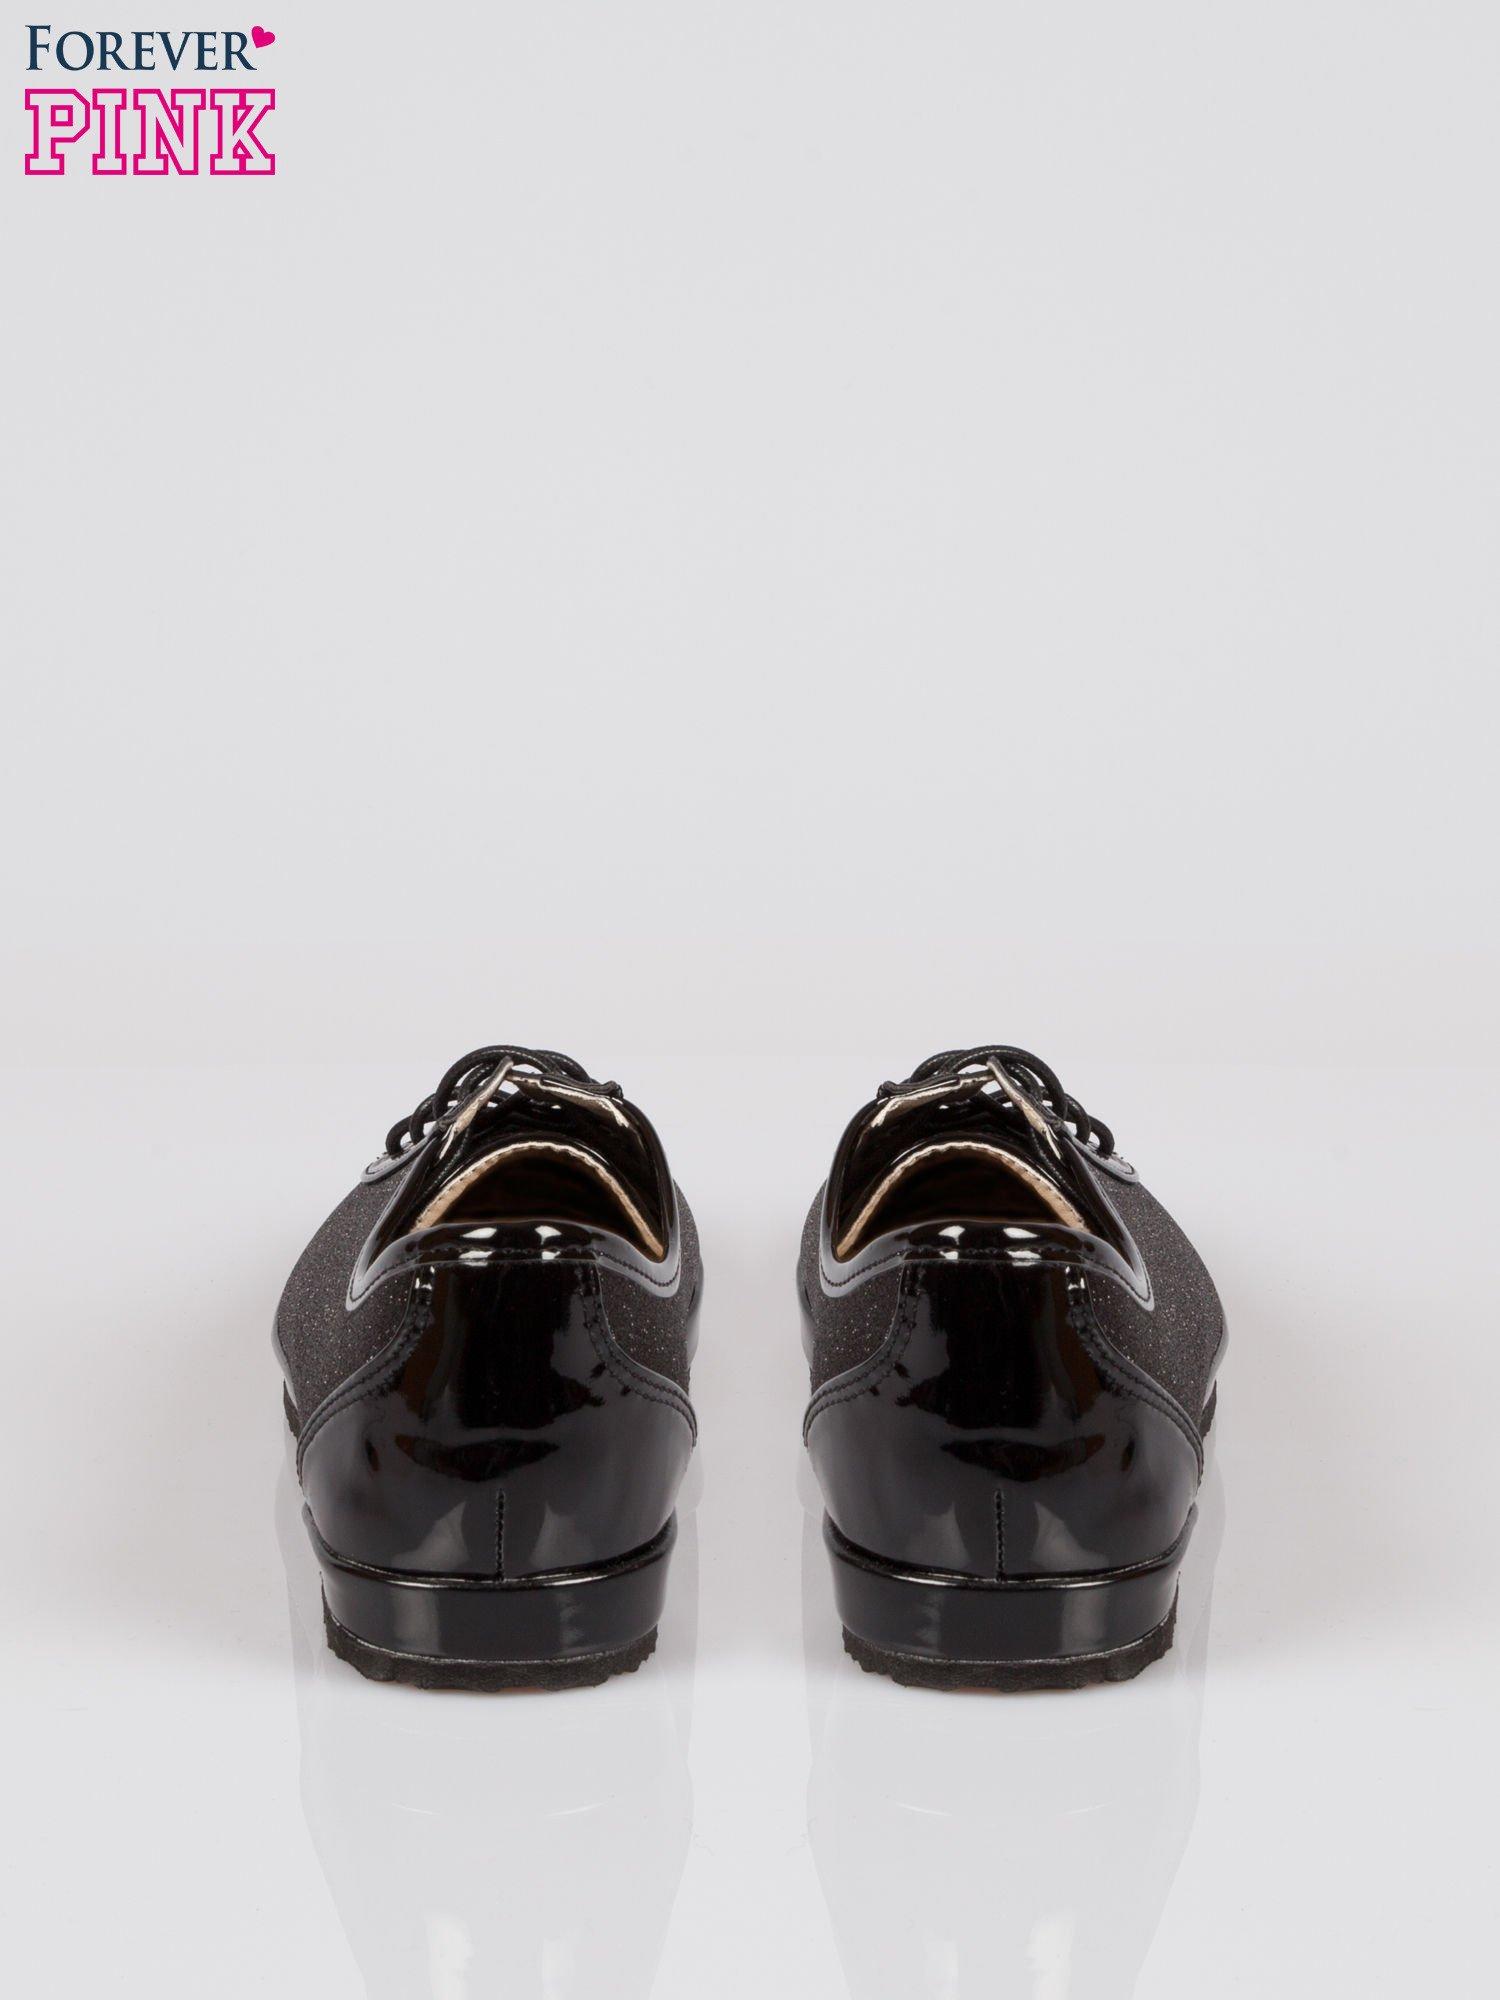 Czarne buty sportowe faux leather Adorable z efektem glitter                                  zdj.                                  3